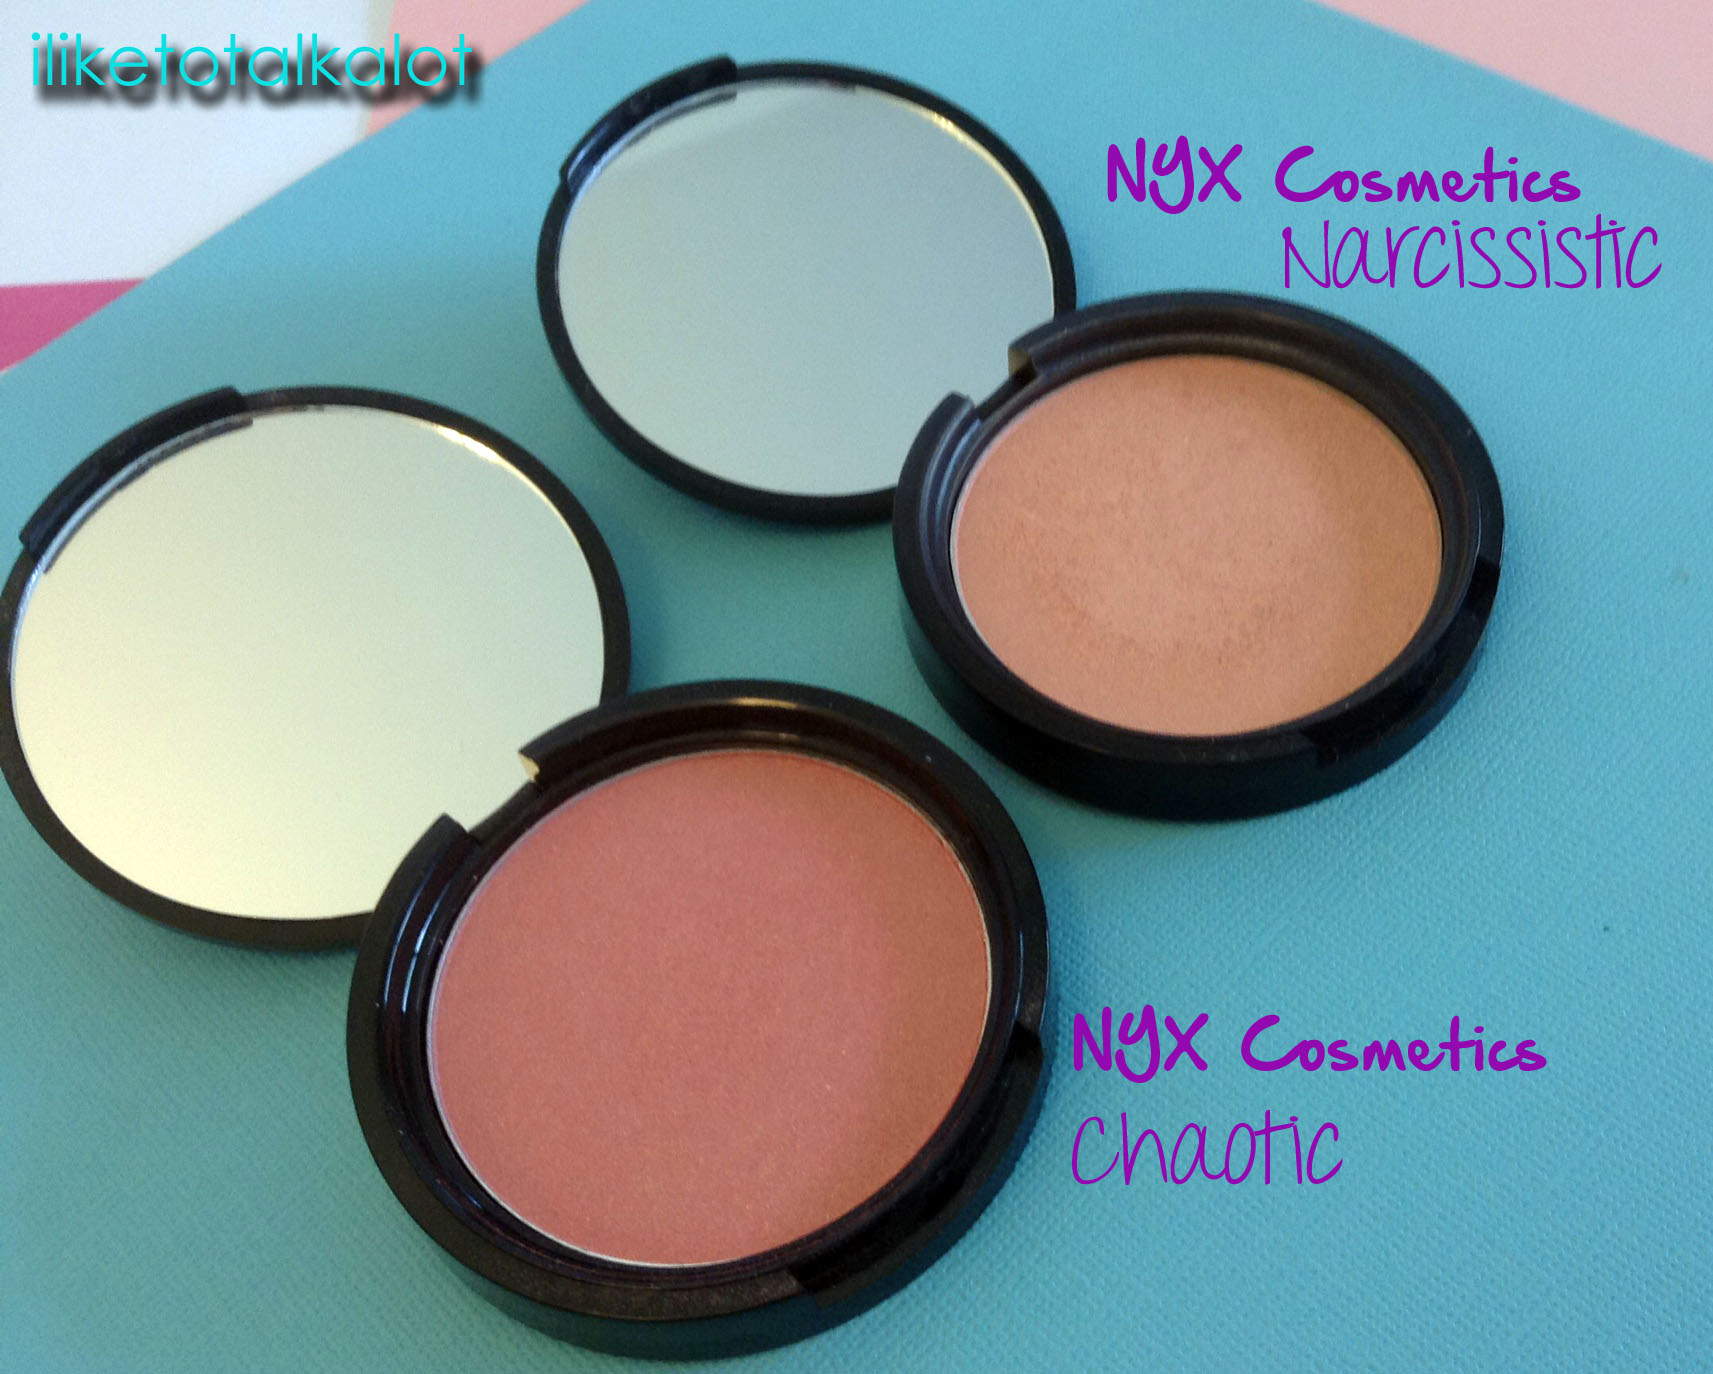 Favorites From NYX Cosmetics! - iliketotalkalotiliketotalkalot Nyx Narcissistic